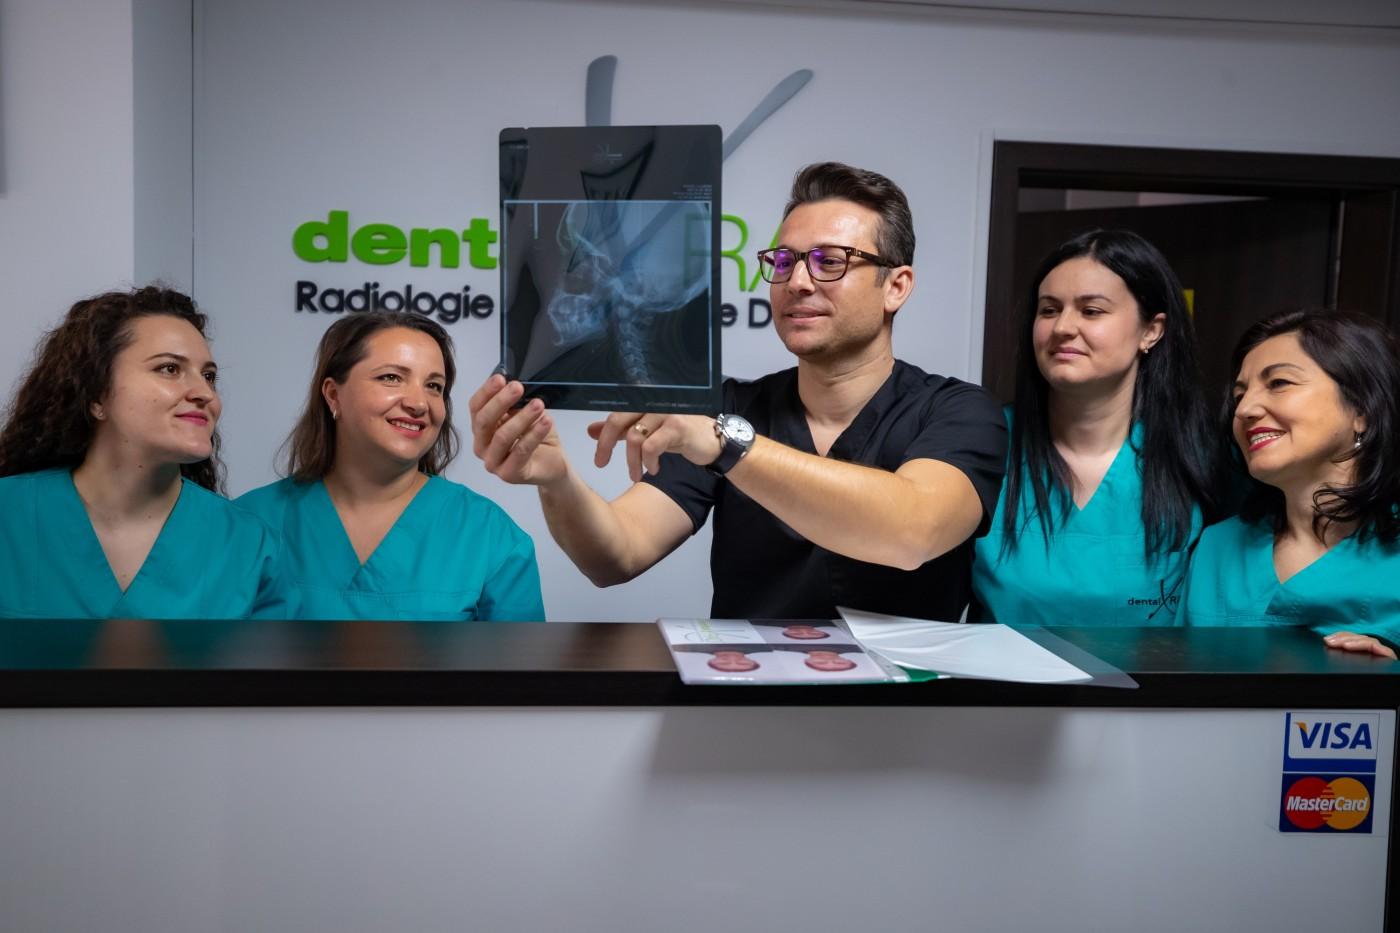 radiografie dentara targoviste, dental x rad